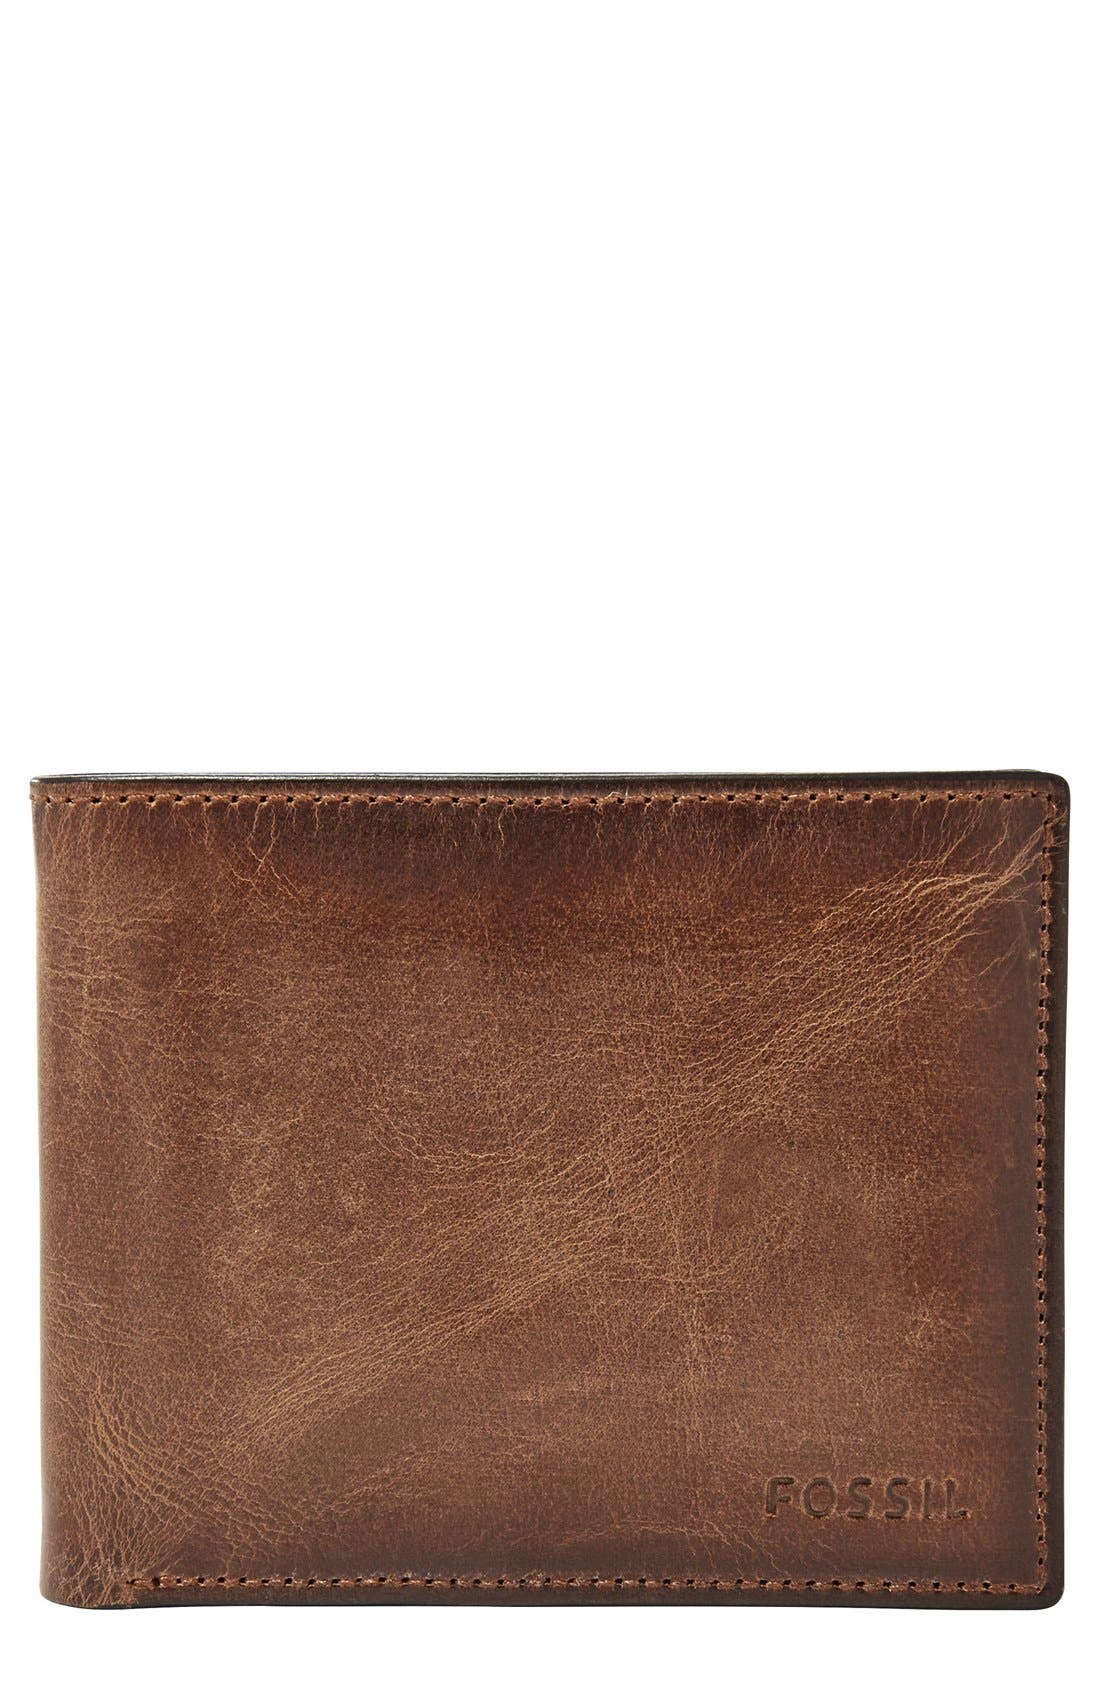 'Derrick' Leather Flip Trifold Wallet,                         Main,                         color, Brown